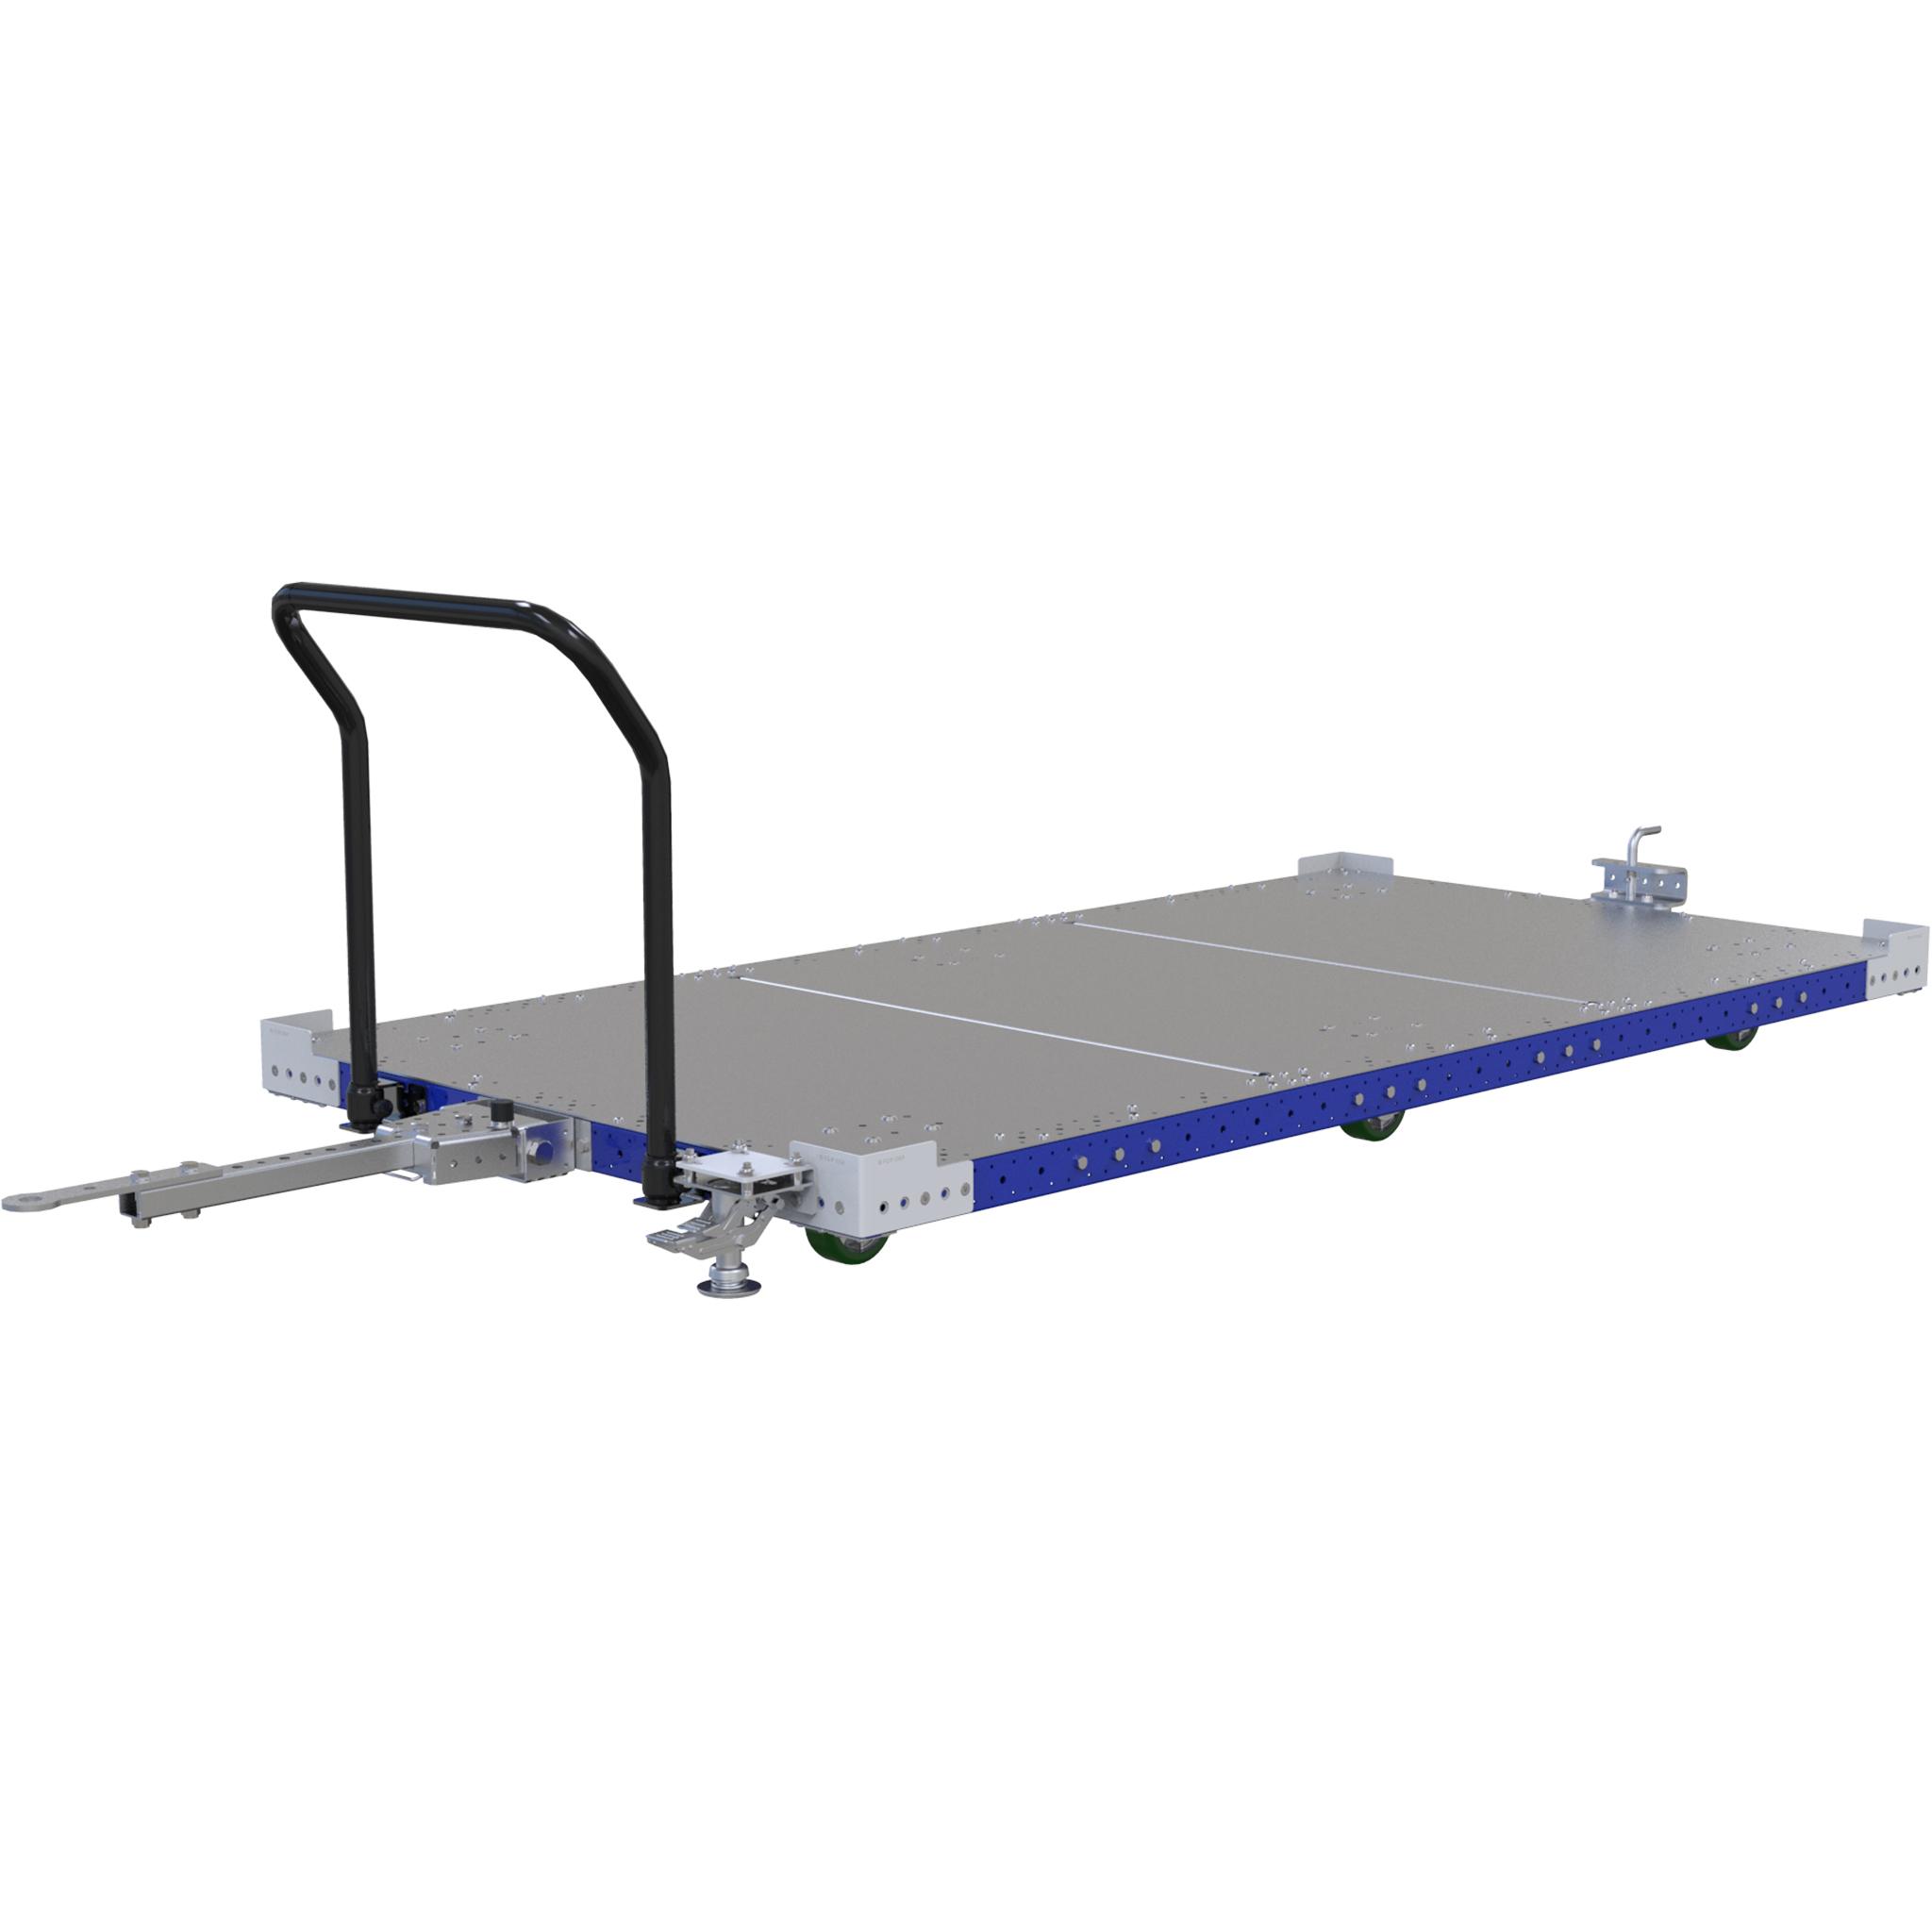 Low Rider Tugger Cart - 1260 x 2450 mm